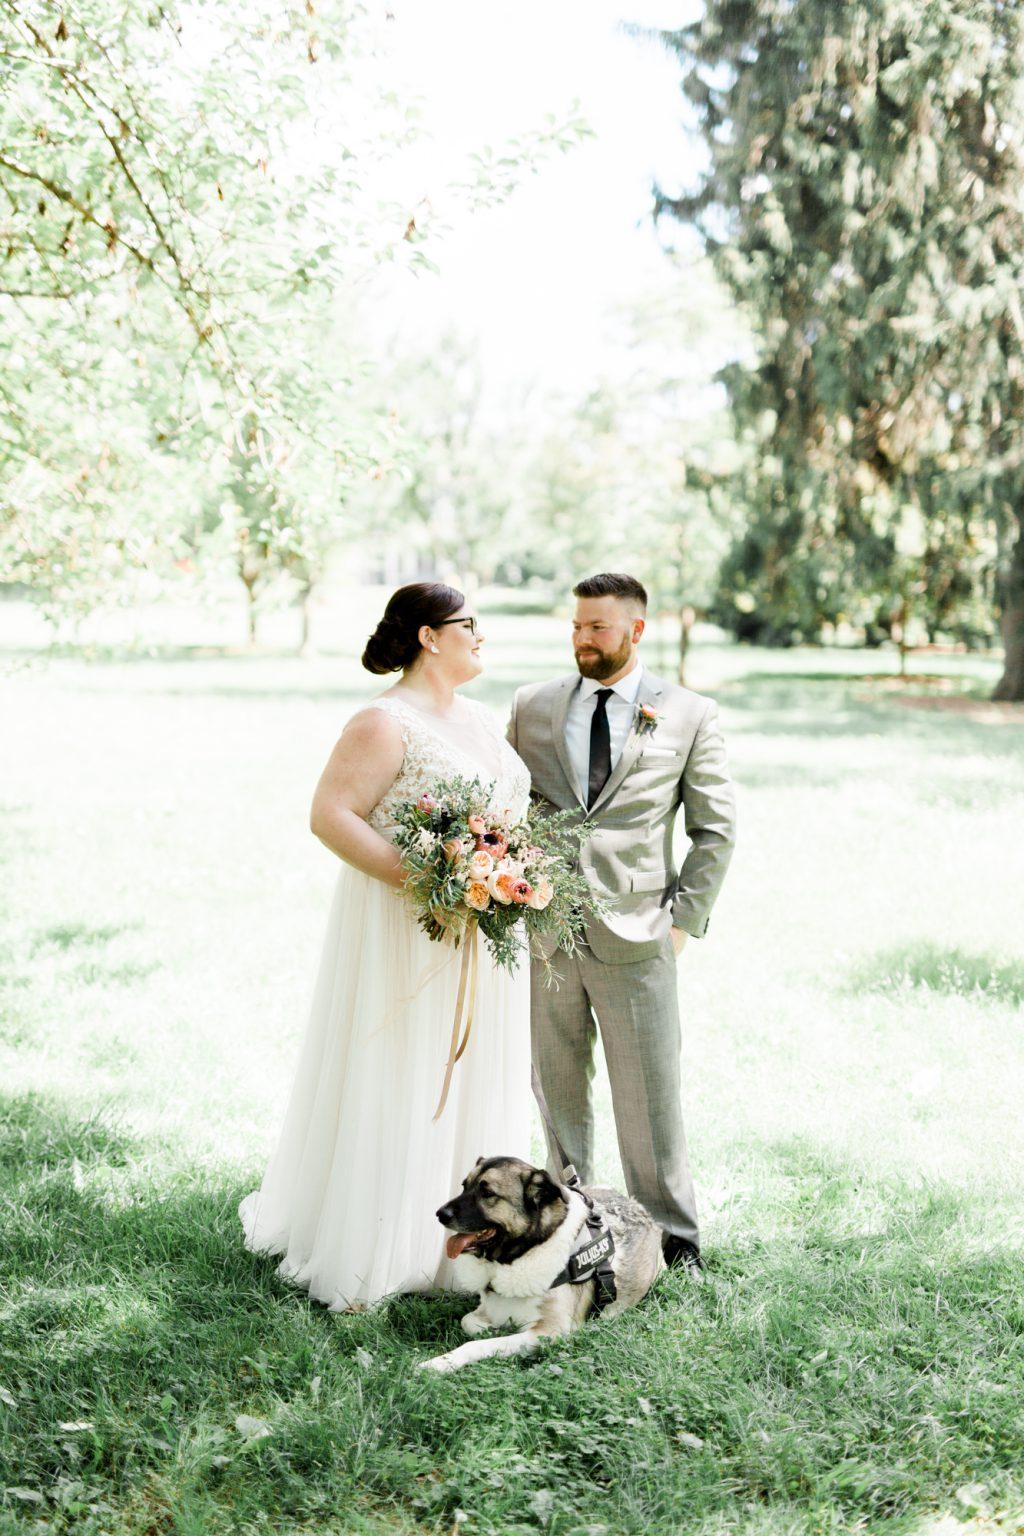 haley-richter-photo-west-chester-summer-wedding-boxcar-brewery-041